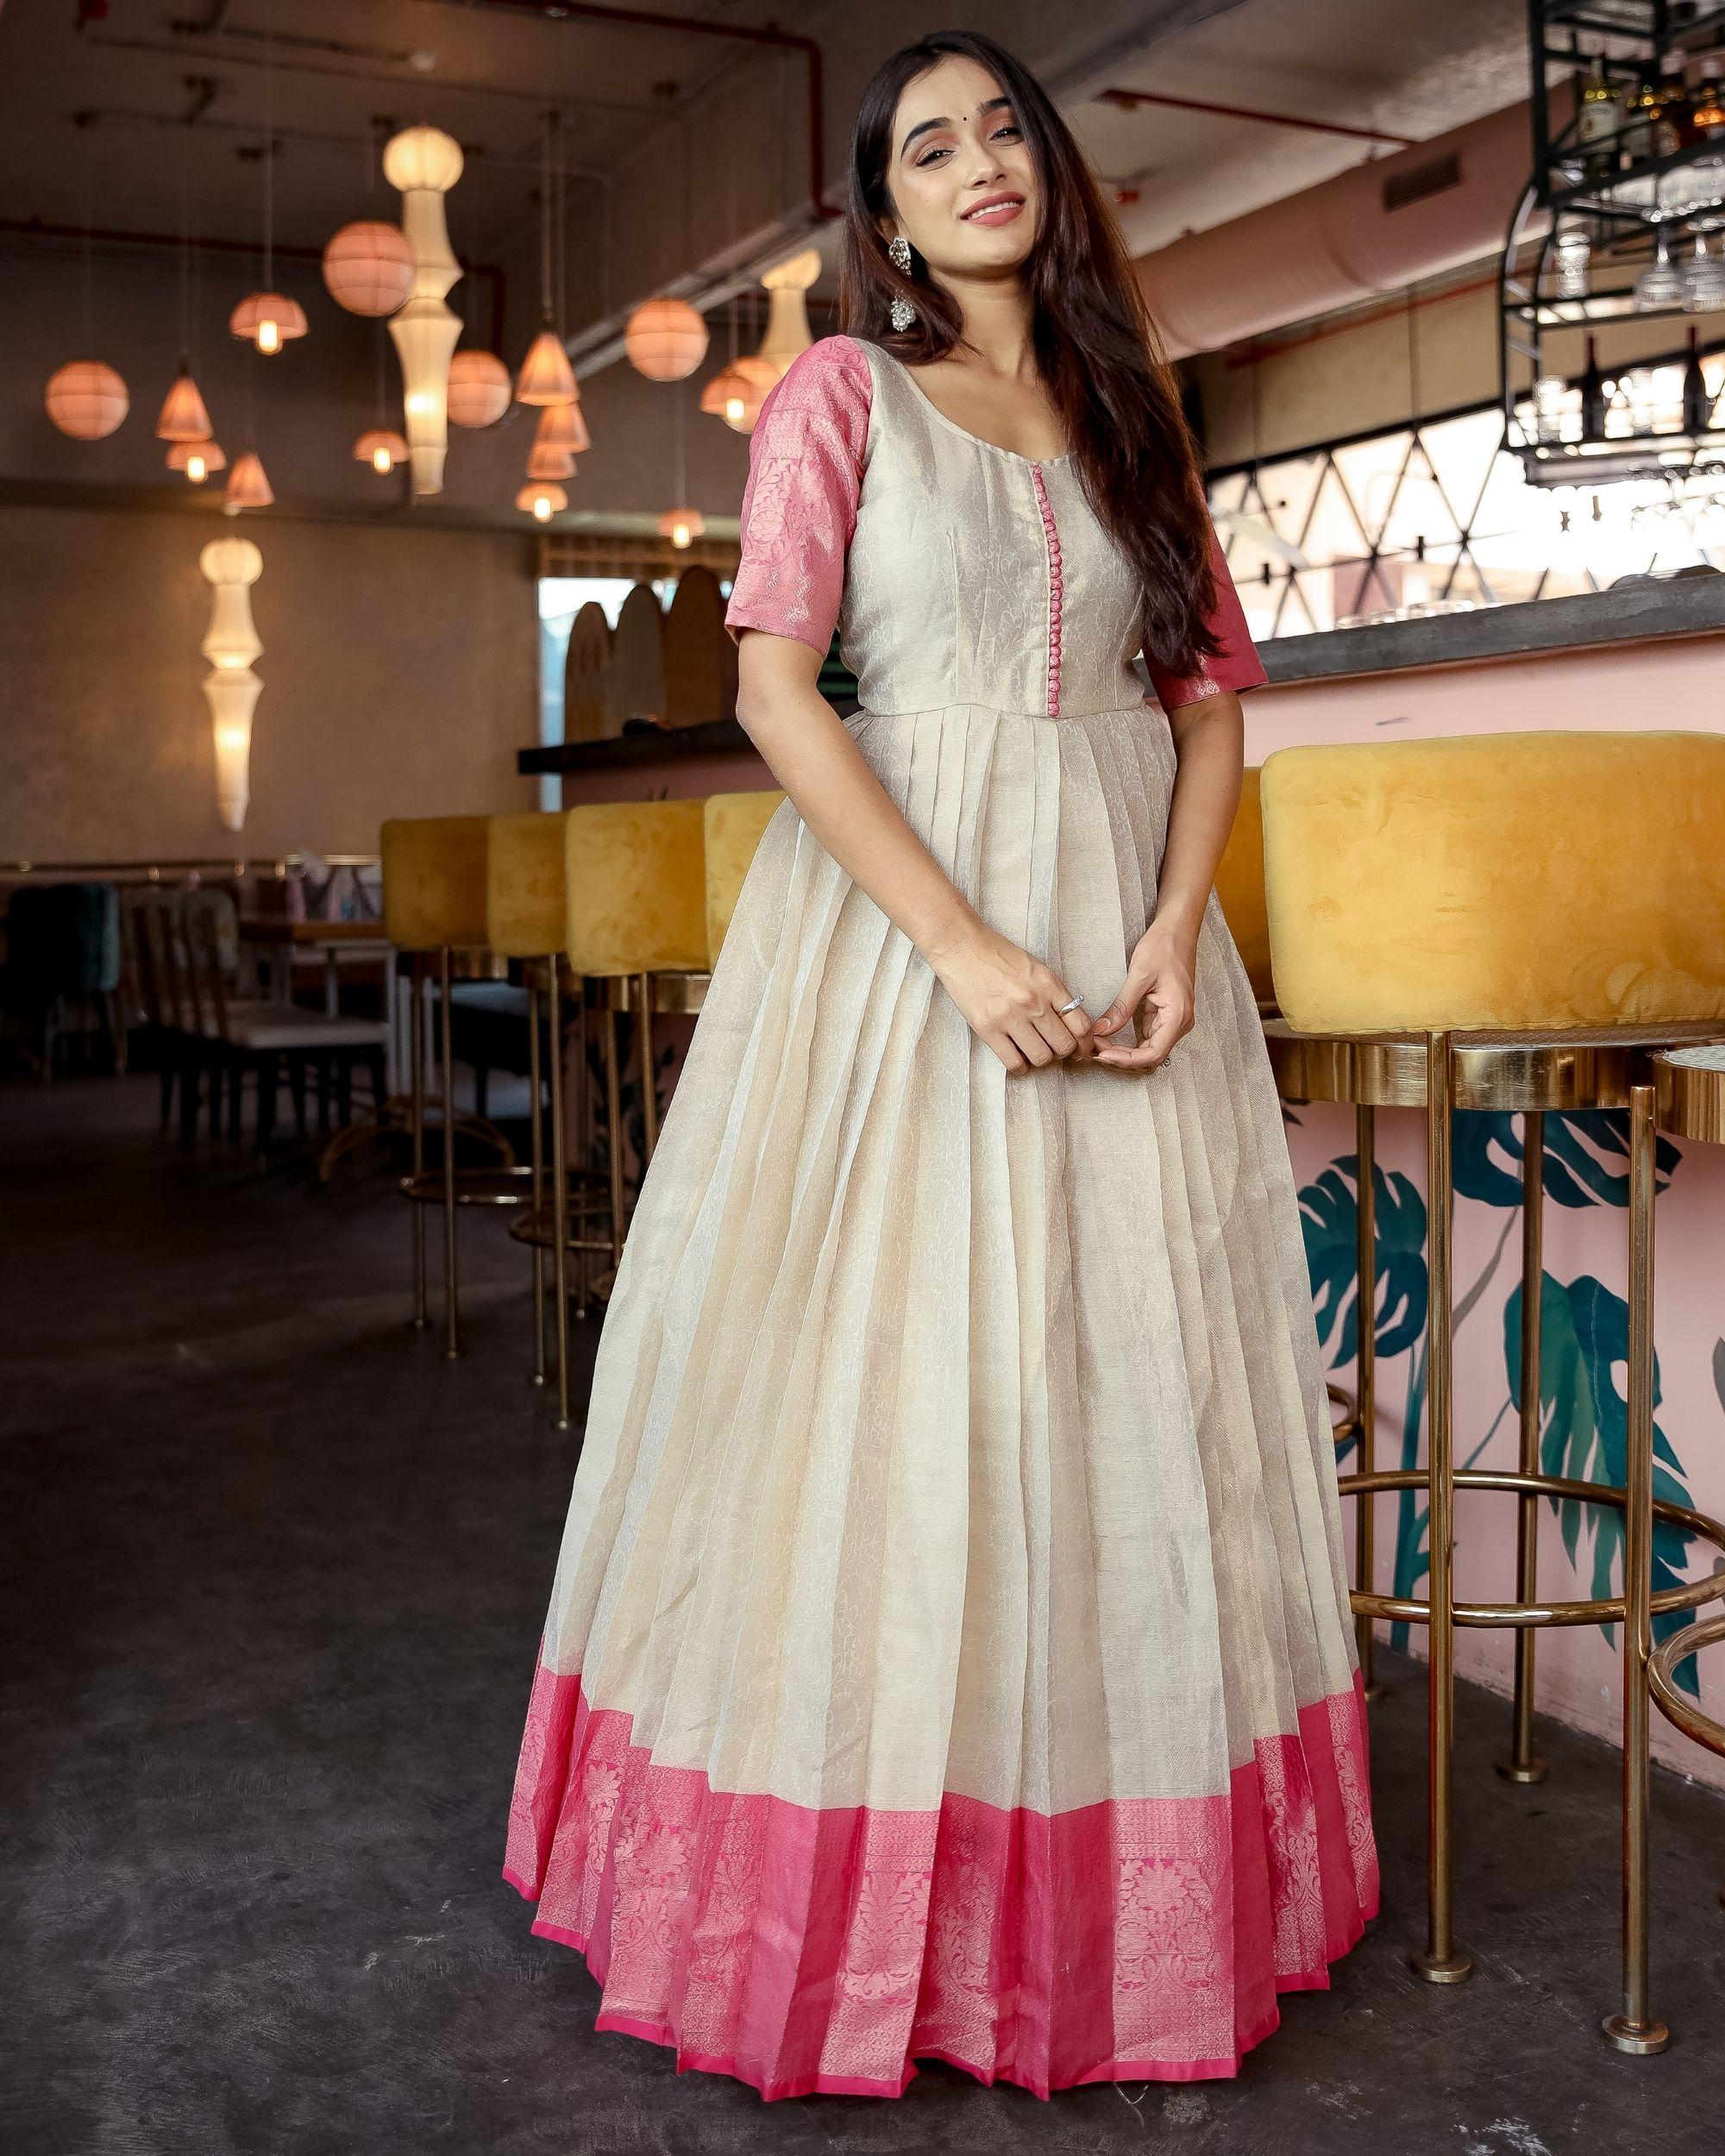 Cream silk pleated gown